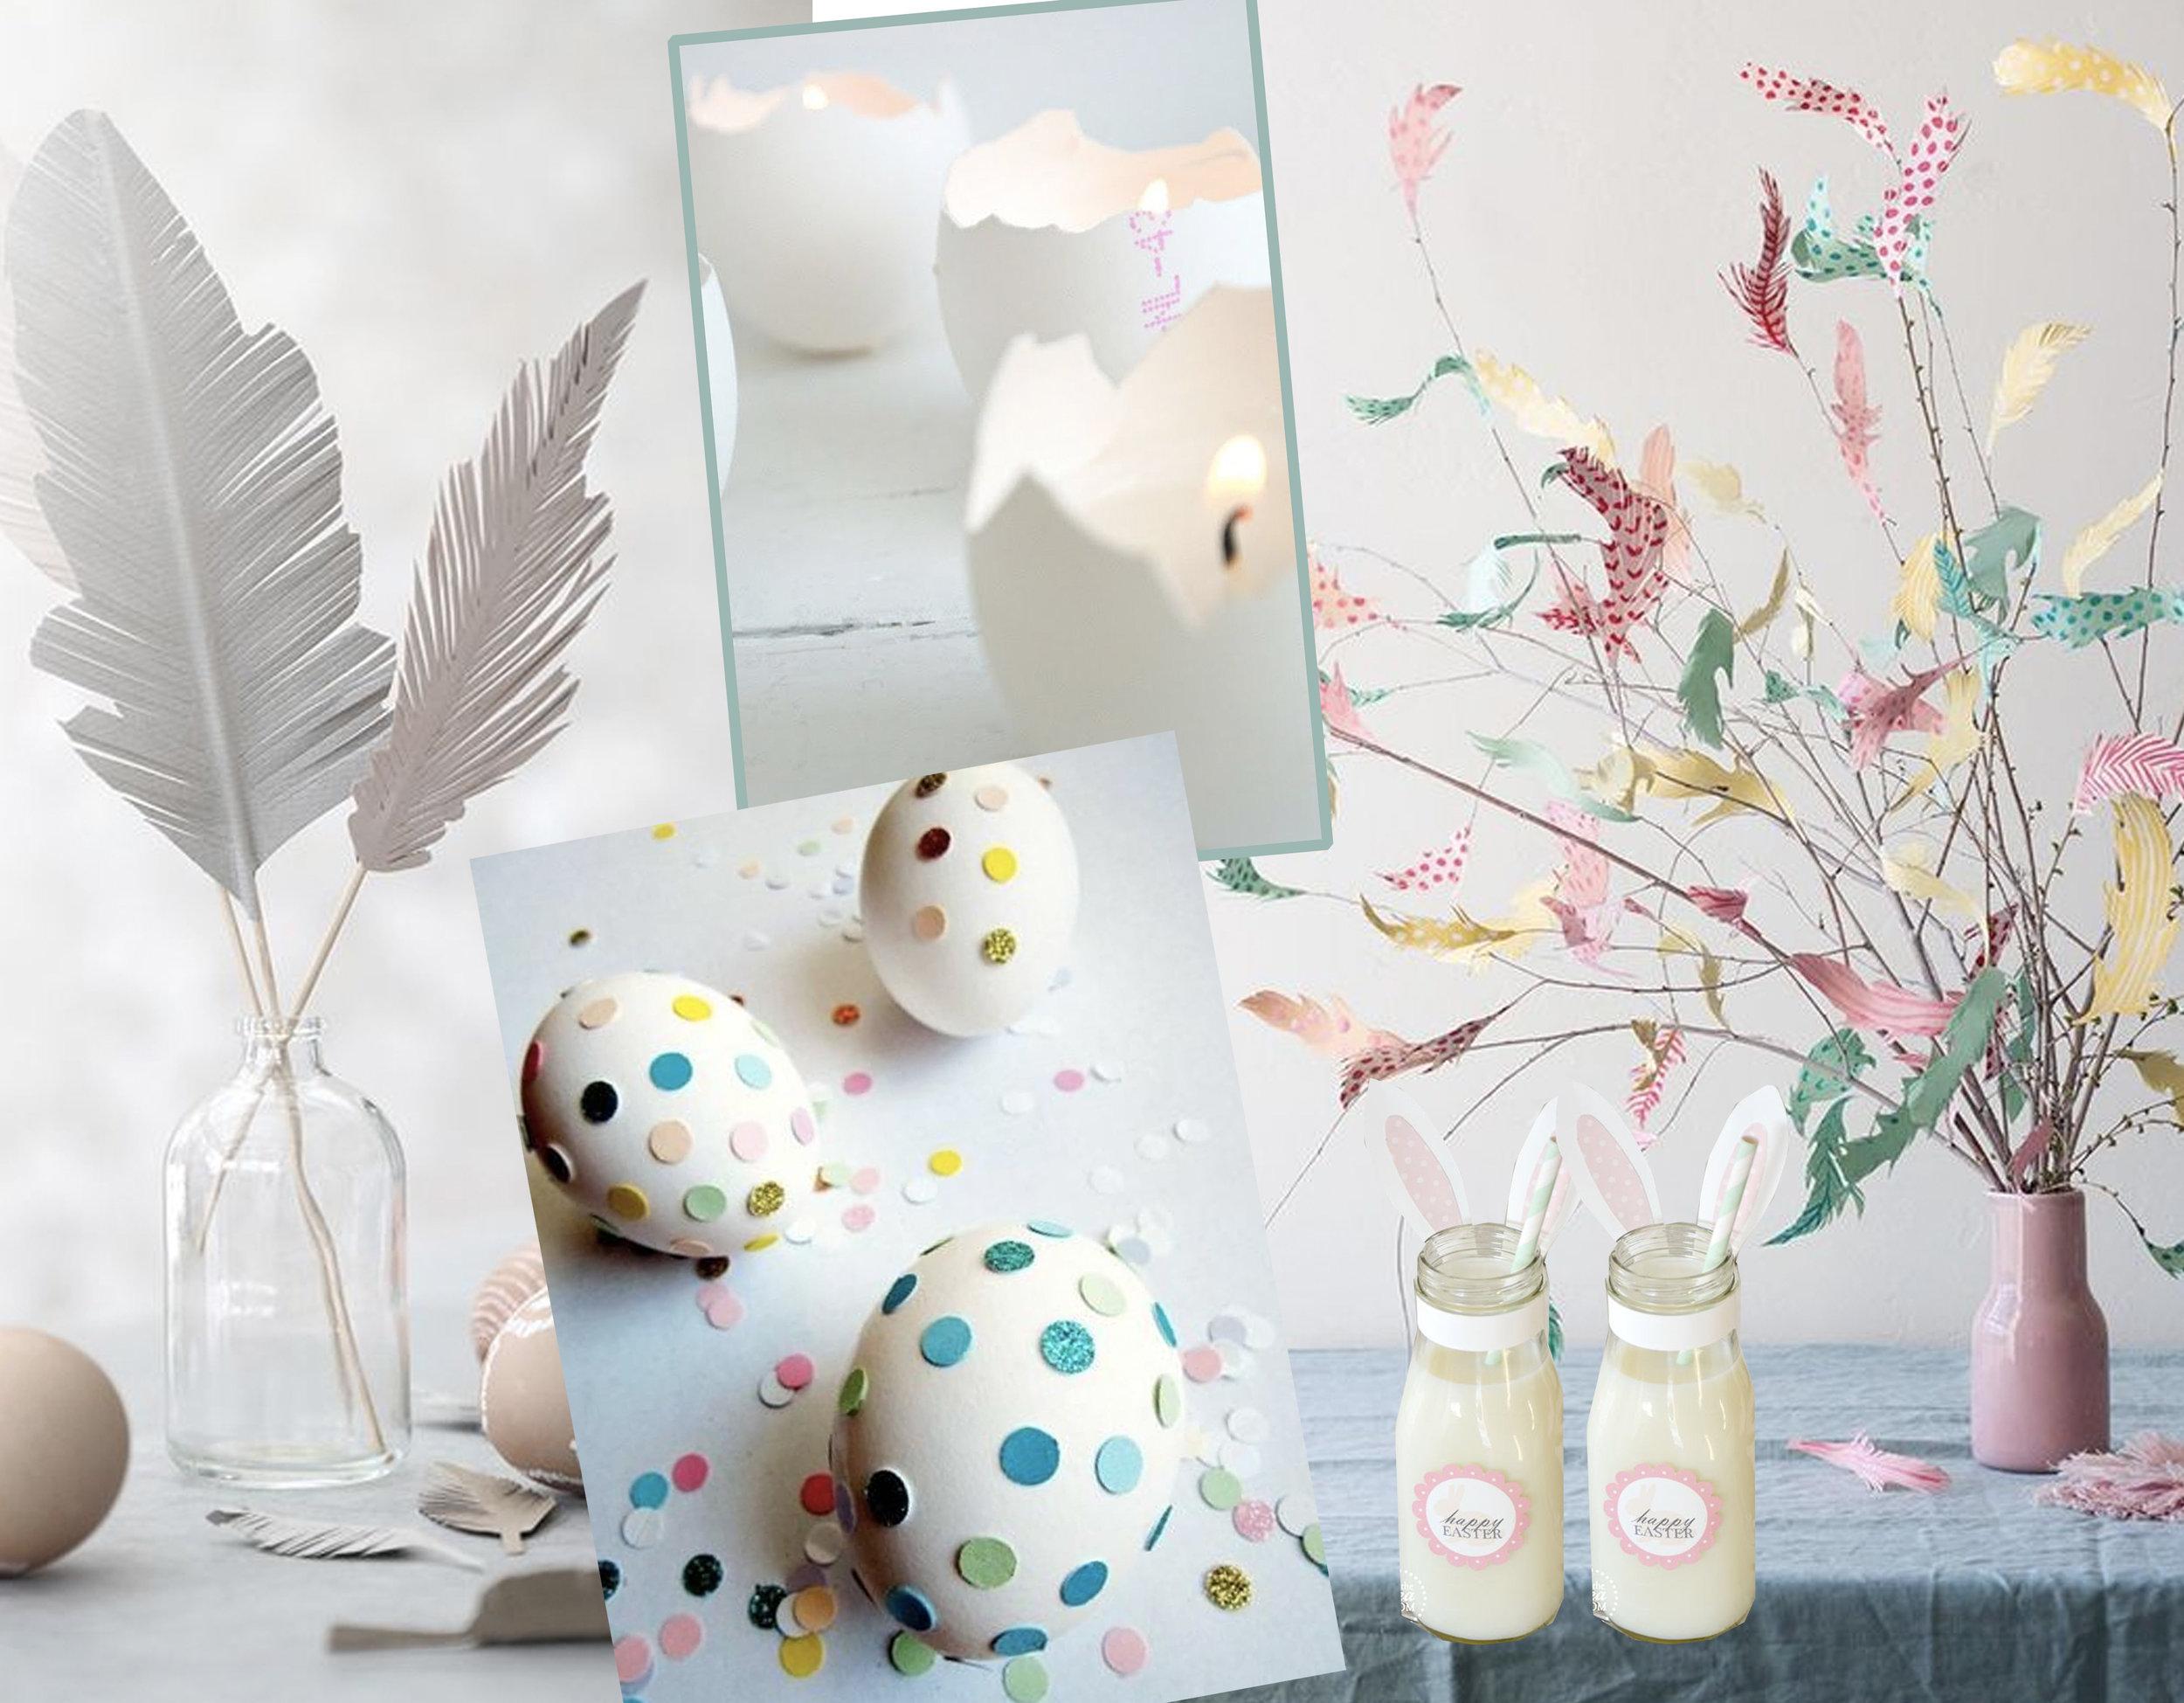 paper feathers via  Trendenser  - eggs with dots via  Spaaz  - egg candles via  Lekker Frisss  - bottles with bunny ears via  The Idea Room  - table decoration via  House Beautiful